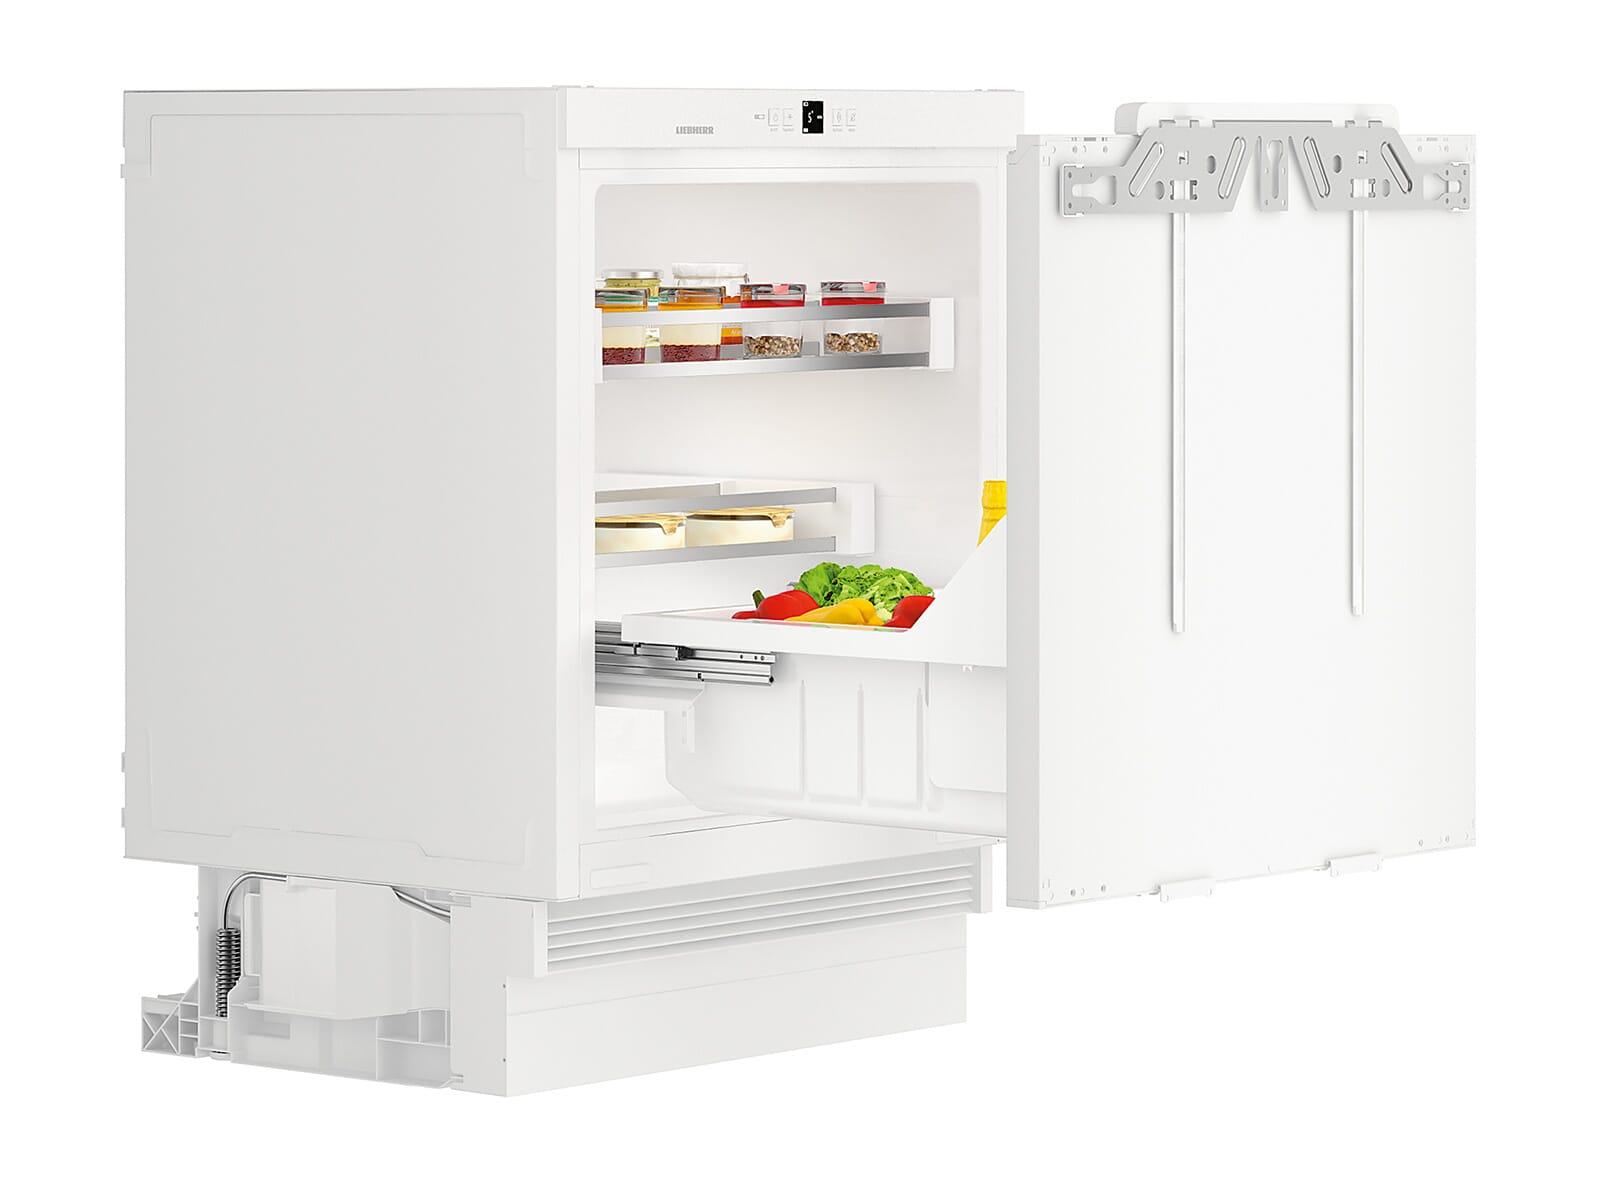 Smeg Kühlschrank Occasion : Smeg kühlschrank weiss gebraucht: smeg kühlschrank defekt fab lnen